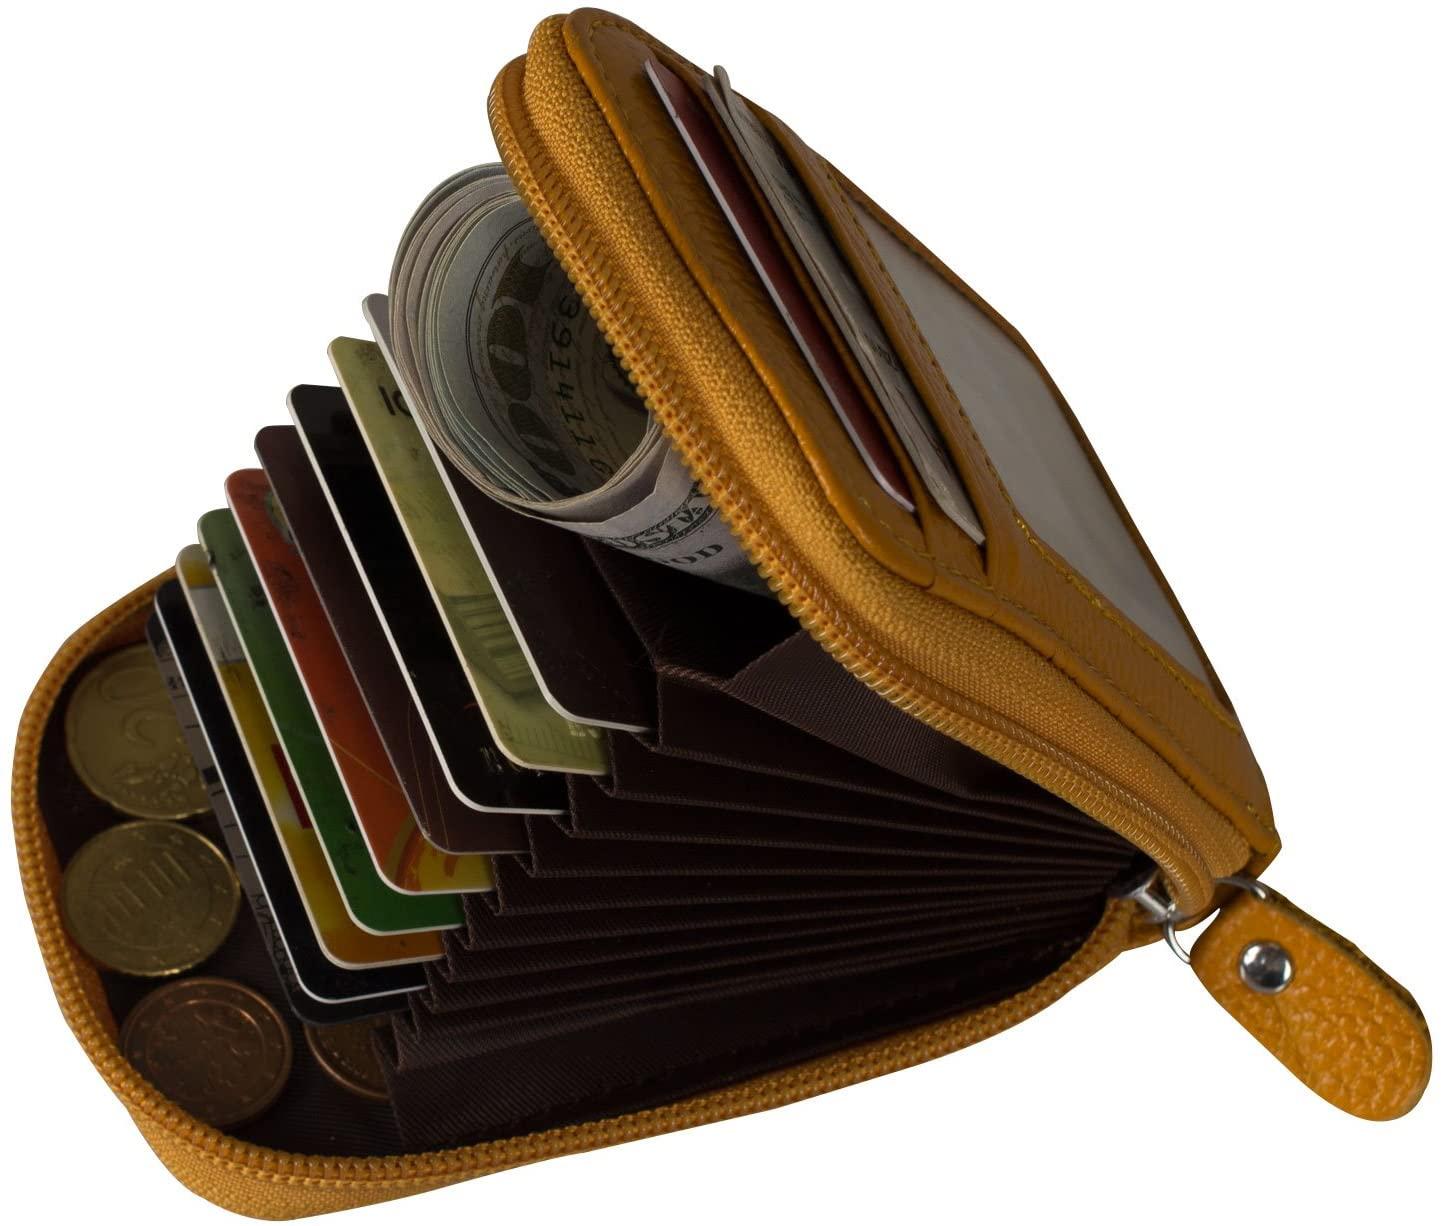 Noedy RFID Blocking Credit Card Case Organizer Genuine Leather Zip-Around Security Wallet Yellow